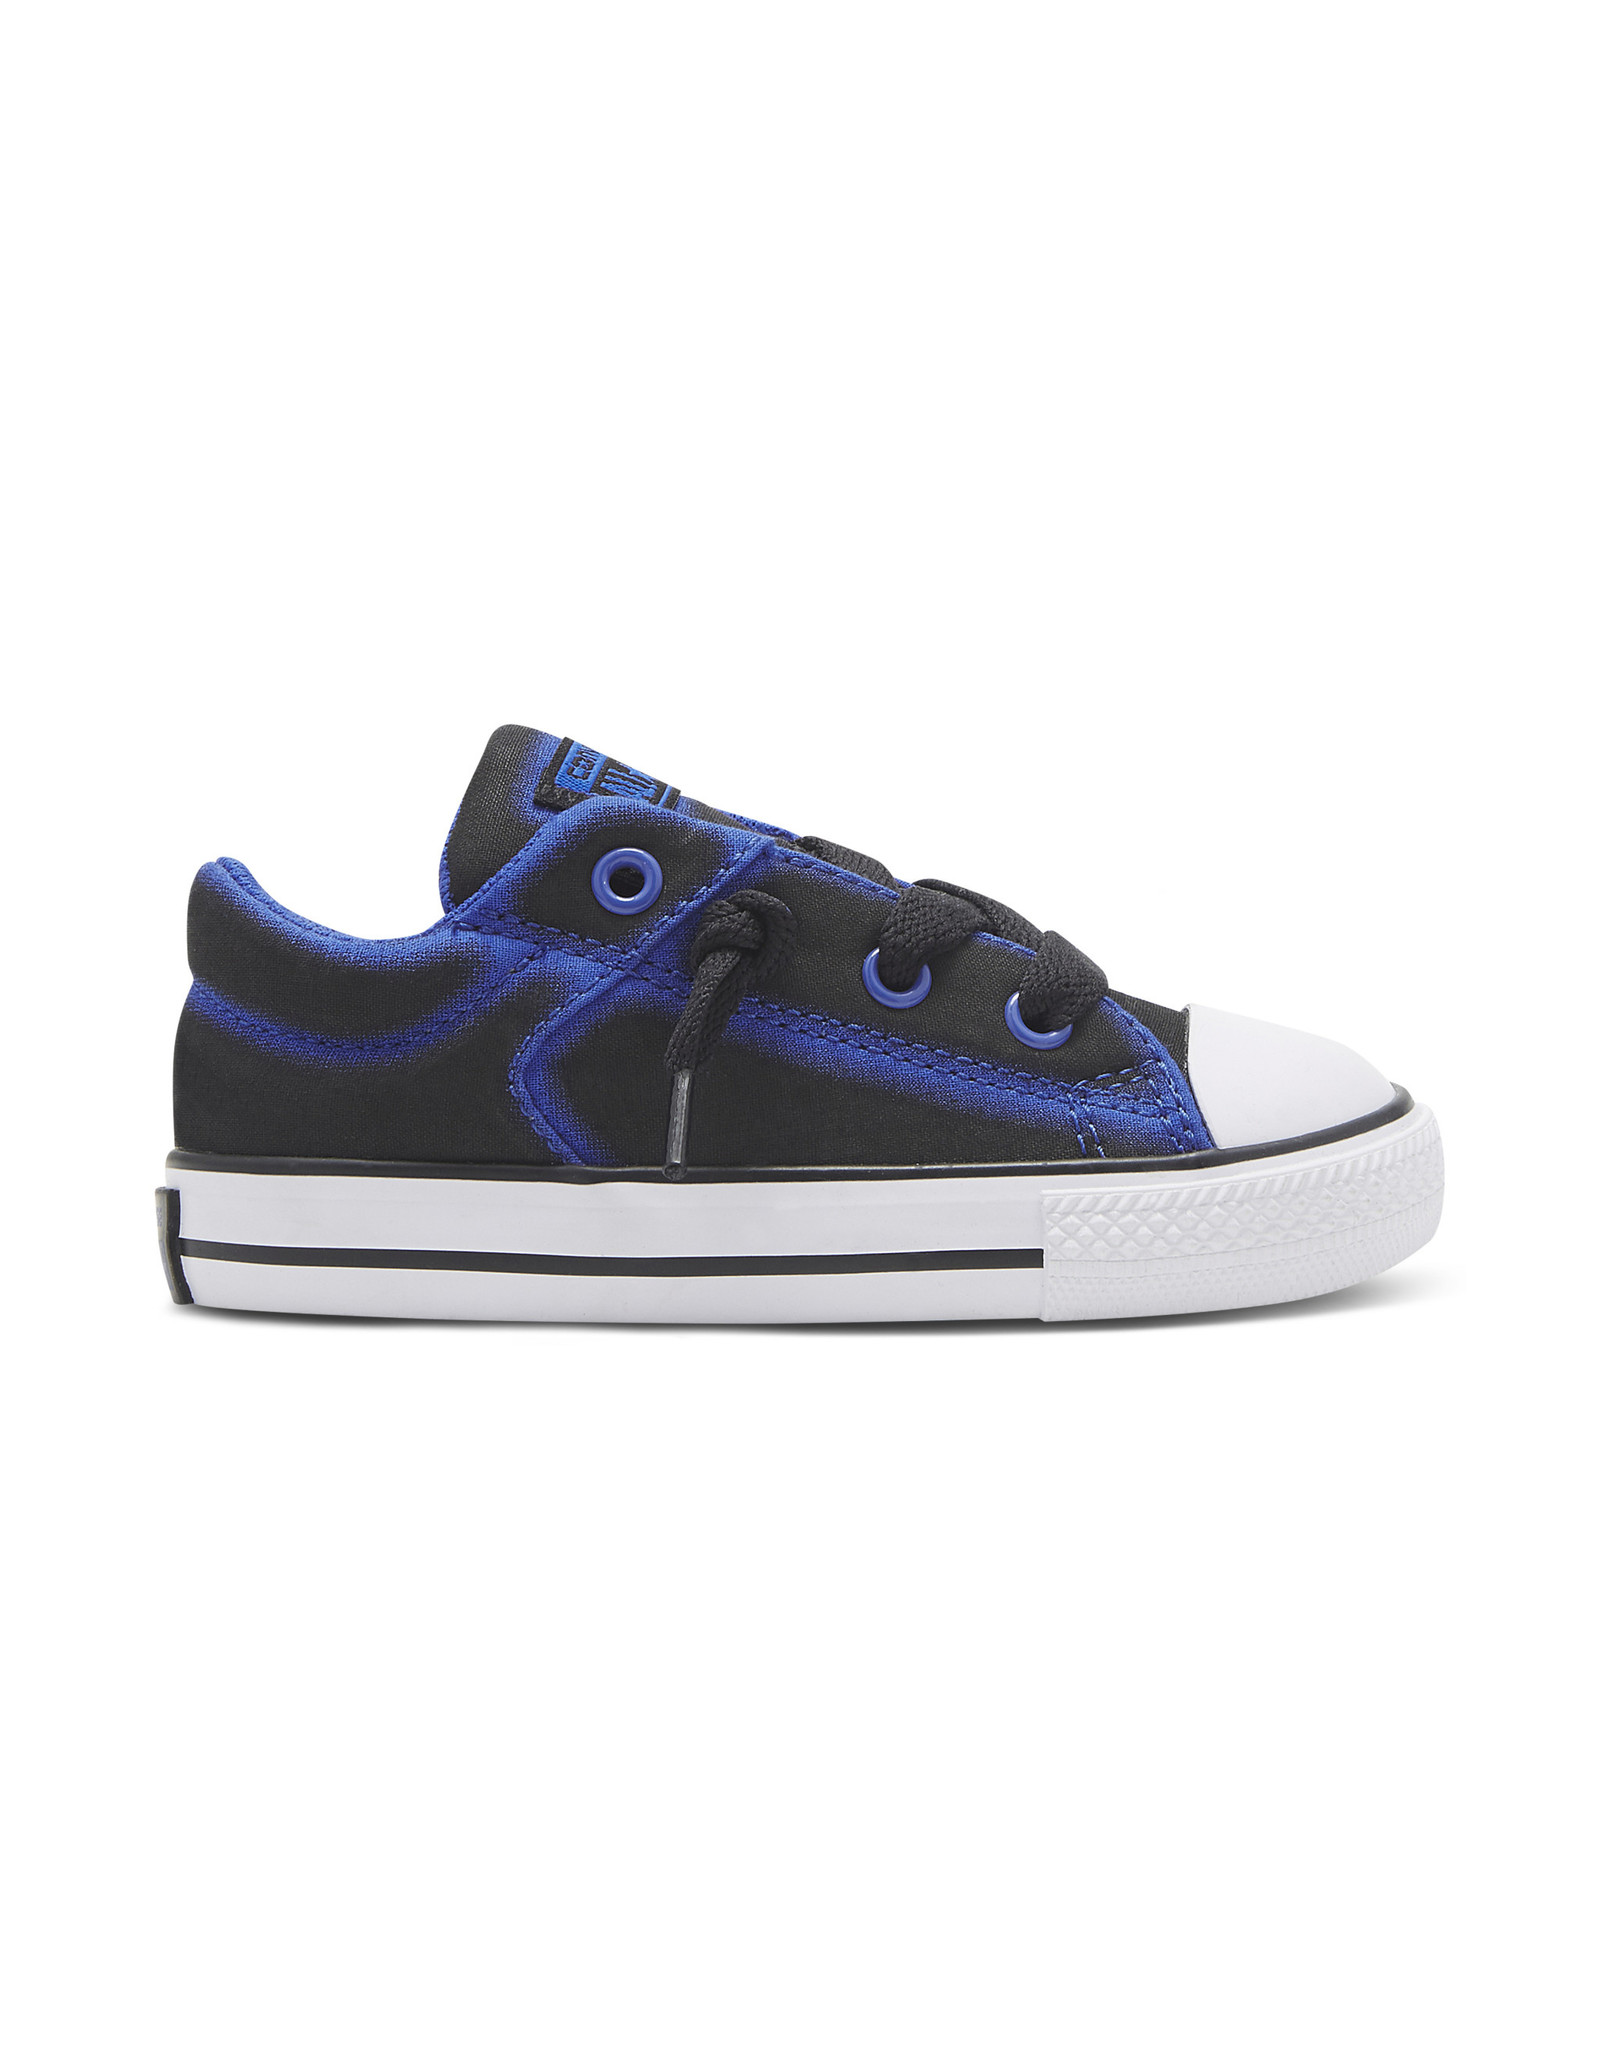 CONVERSE CTAS HIGH STREET SLIP BLACK LASER BLUE CPSBL-751712C